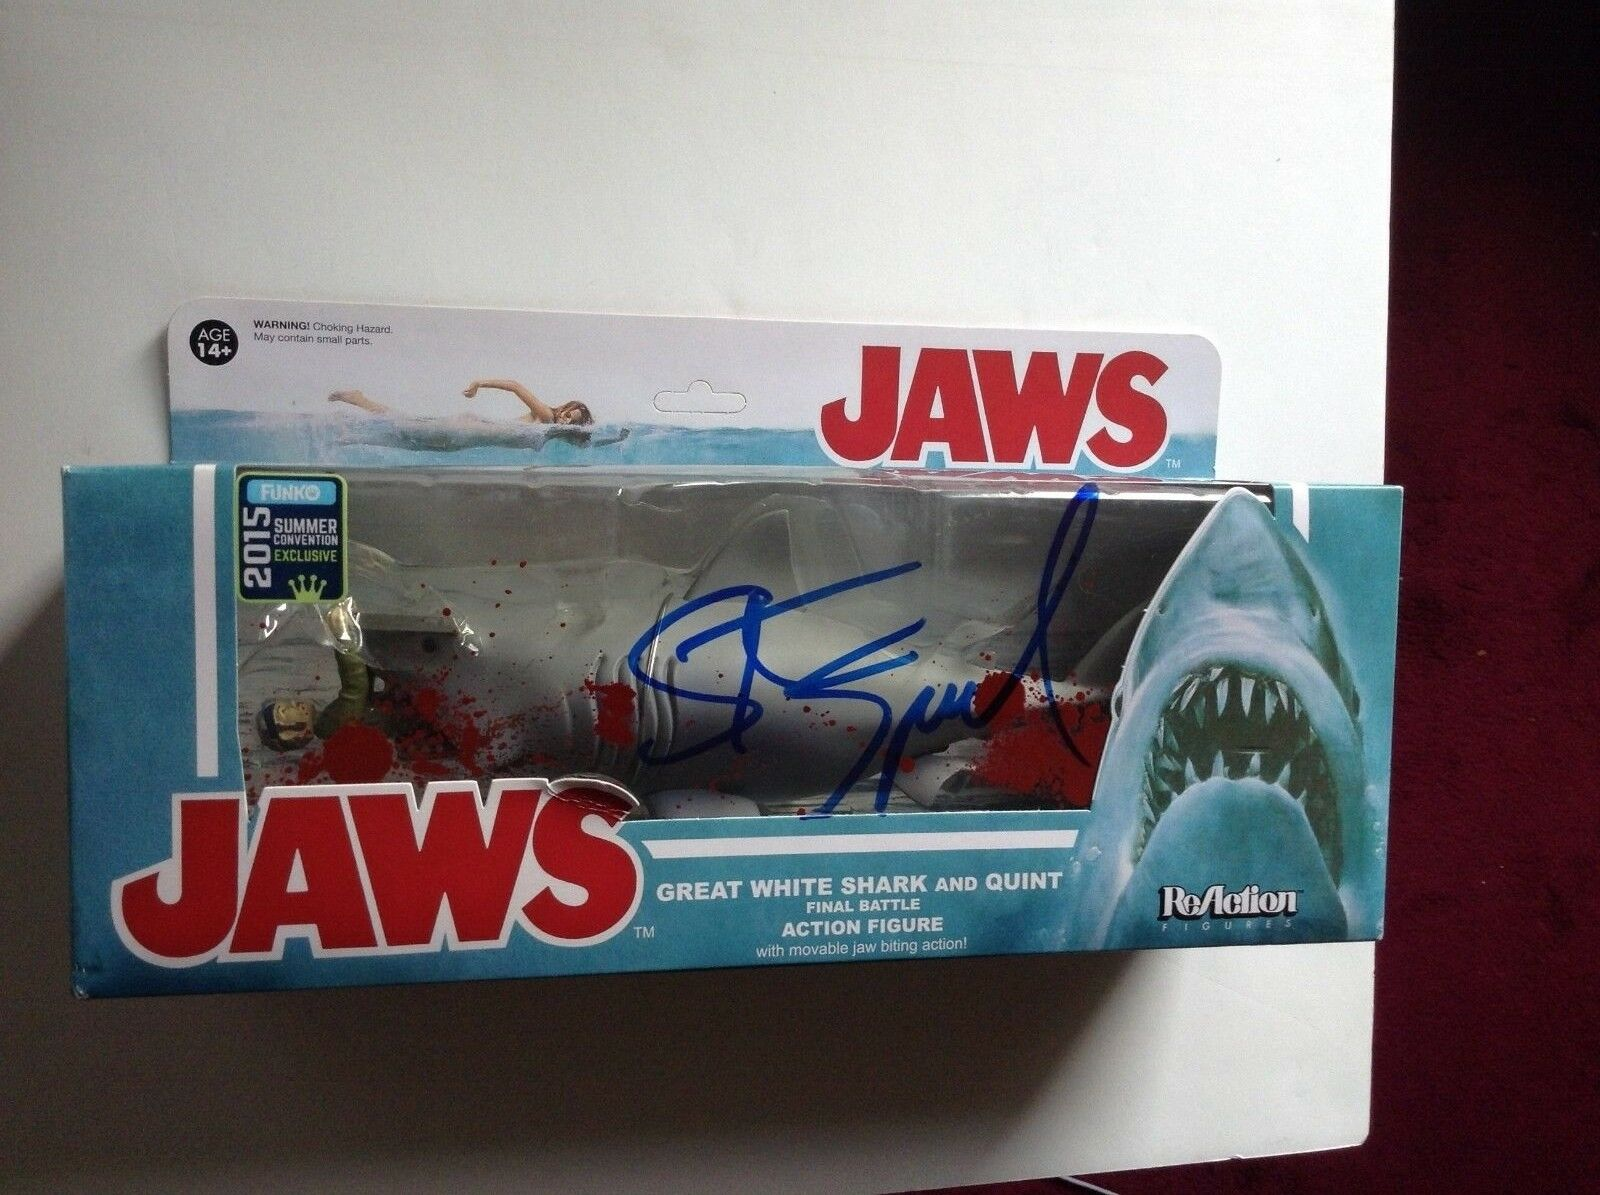 Steven Spielberg signed autograph